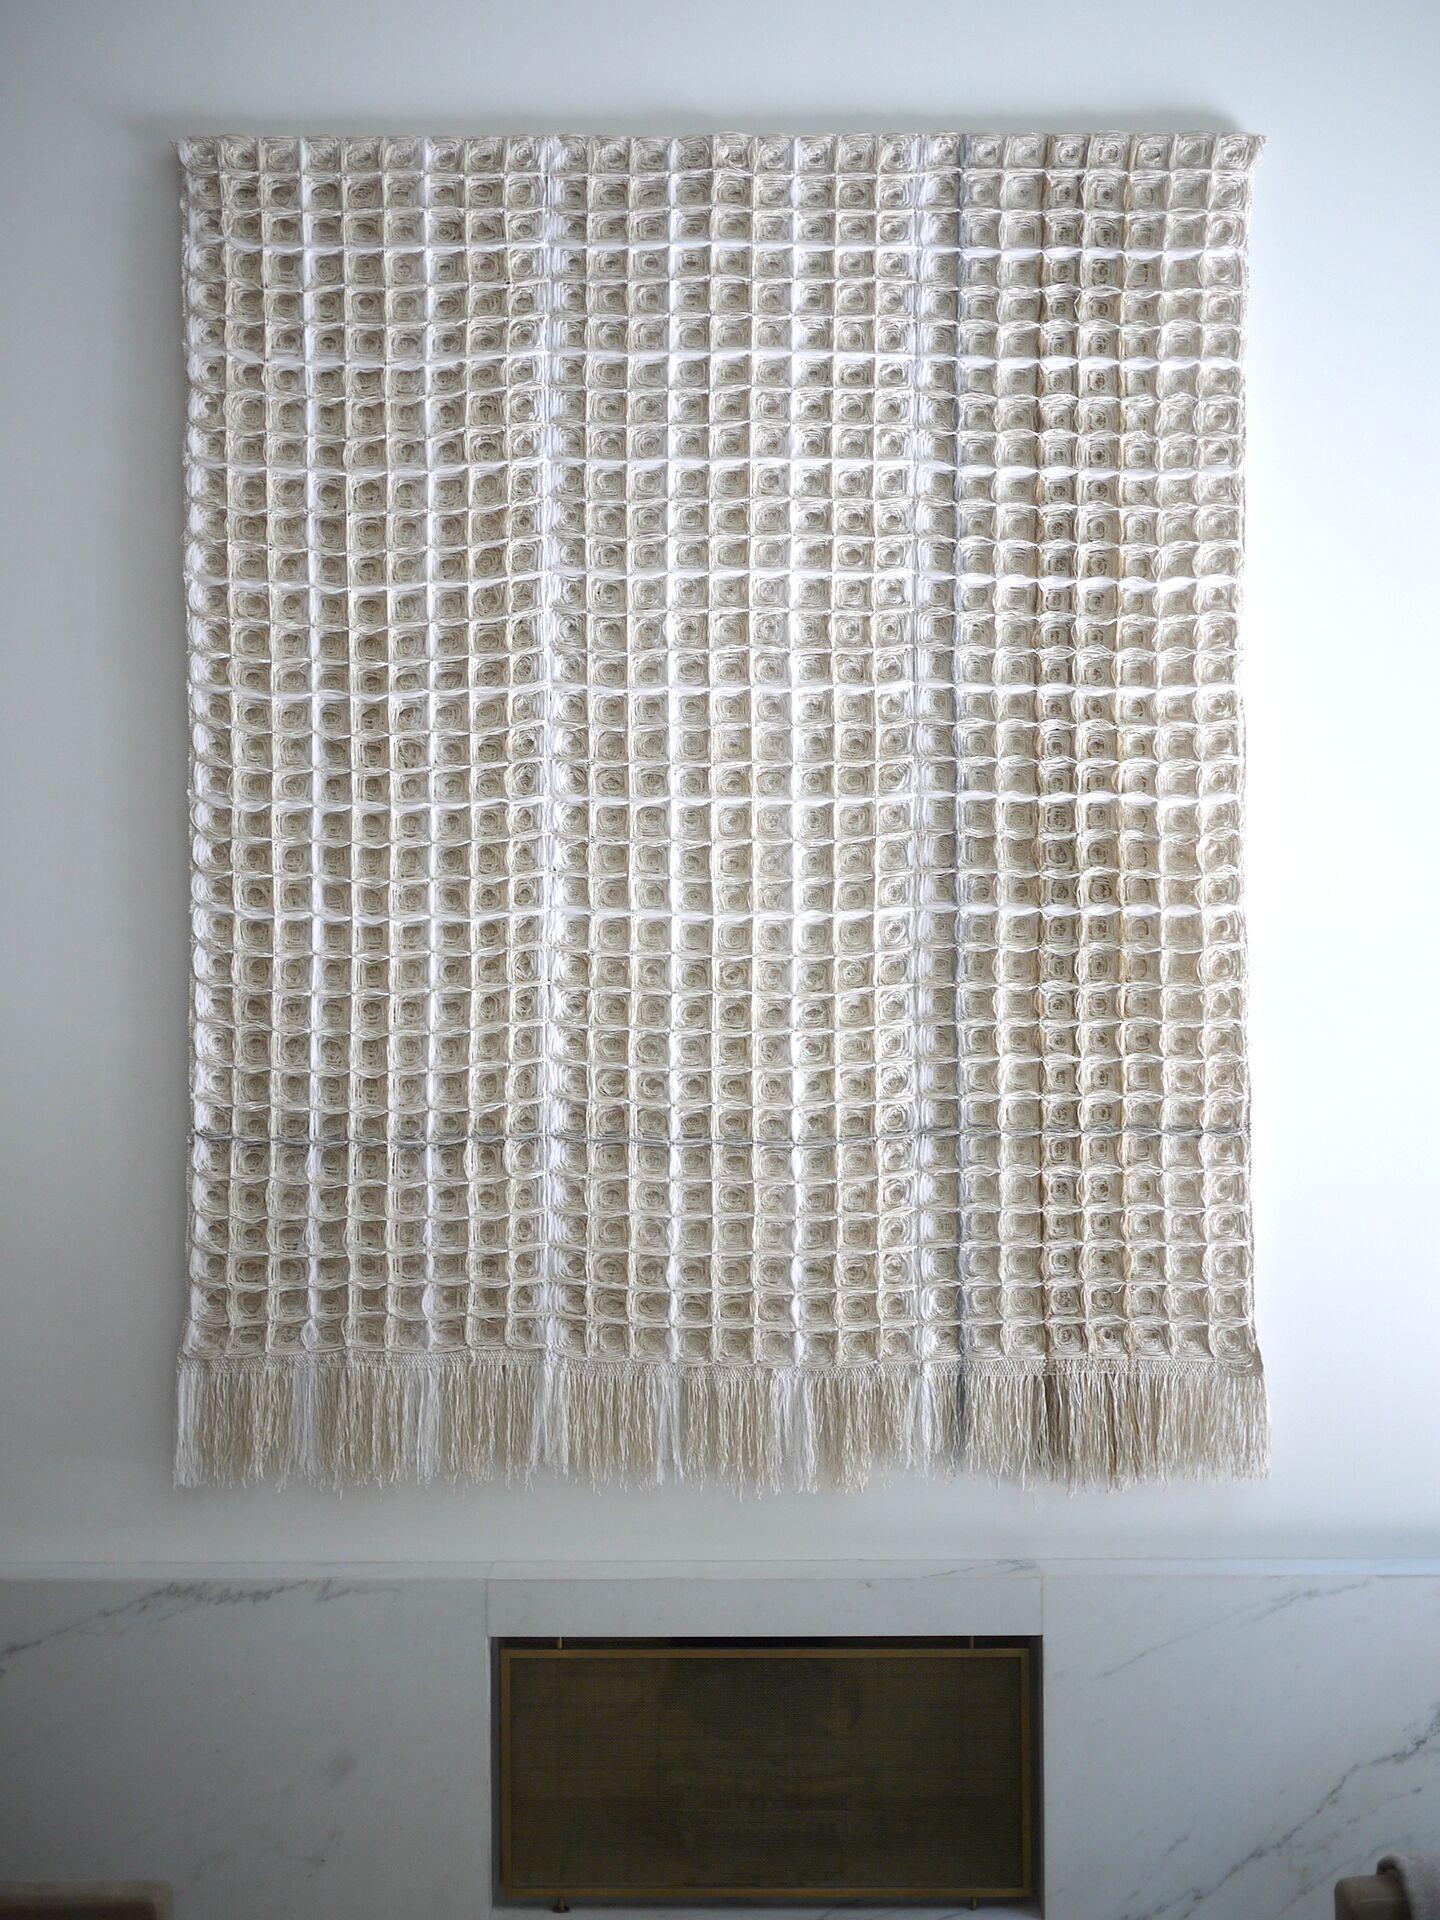 Bridge 397, Hiroko Takeda, 2015, NY Studio, 100%22hx 80%22w, mixed natural fibers.jpg